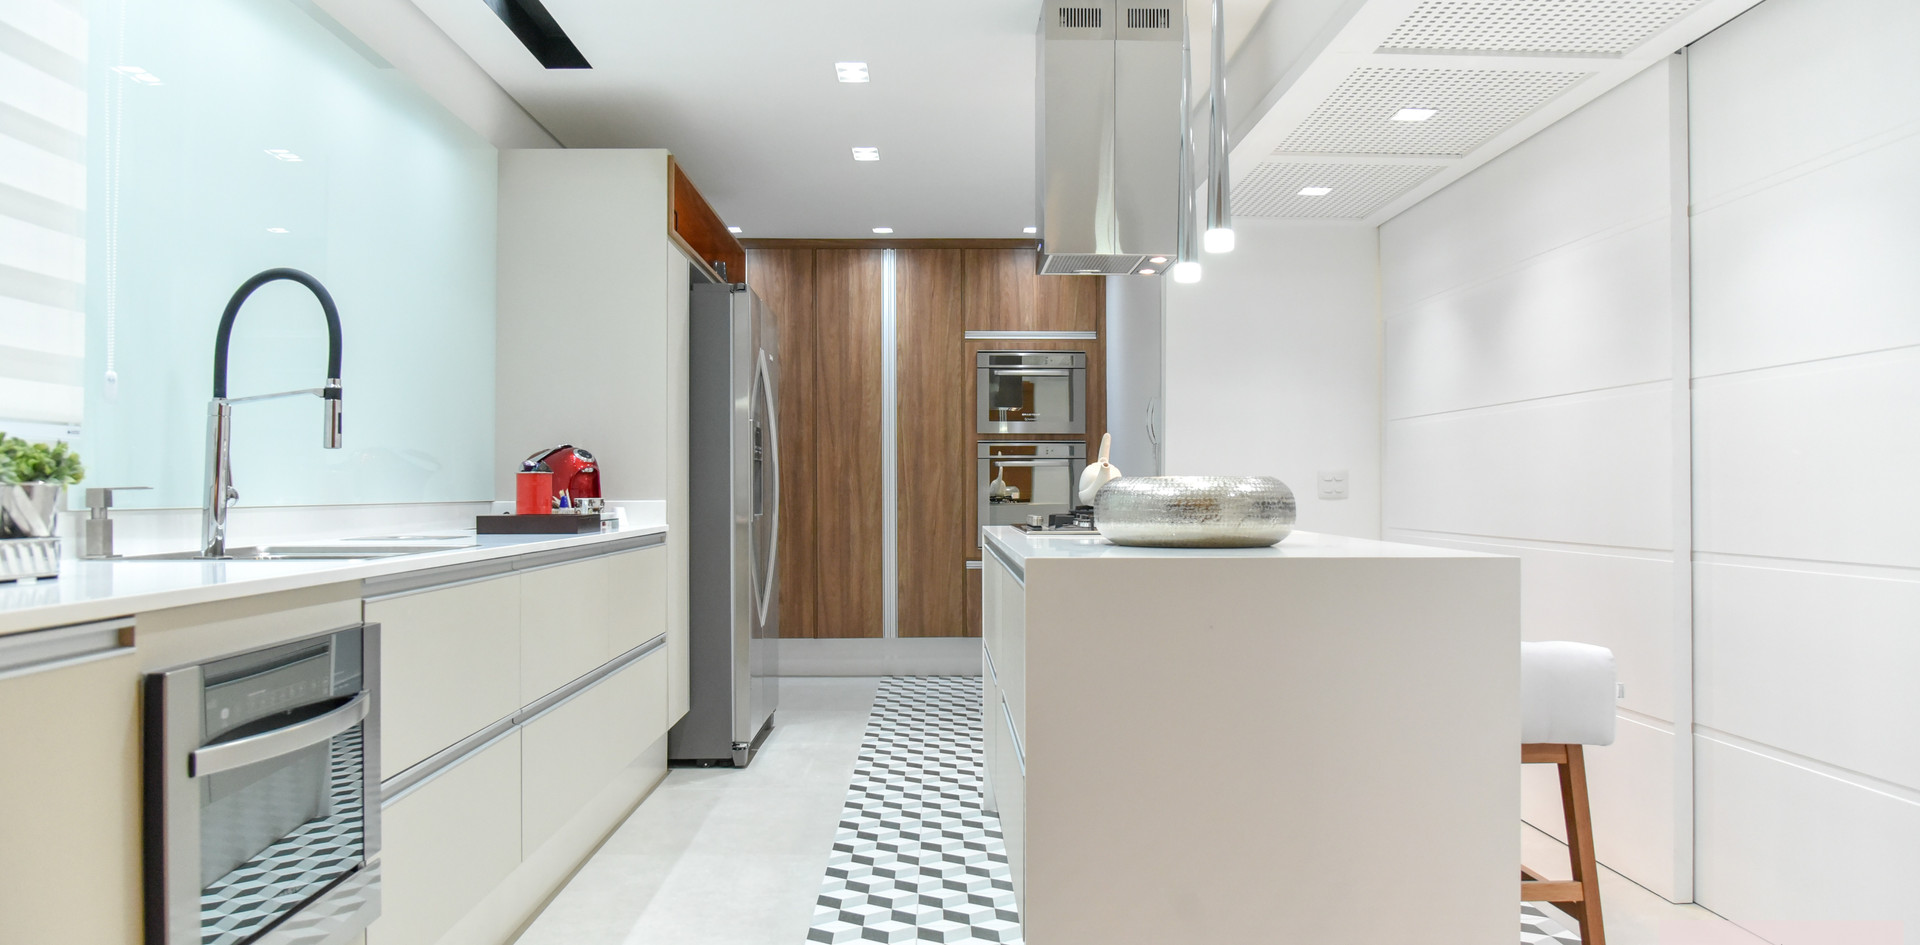 ilha cozinha spazzio design.JPG